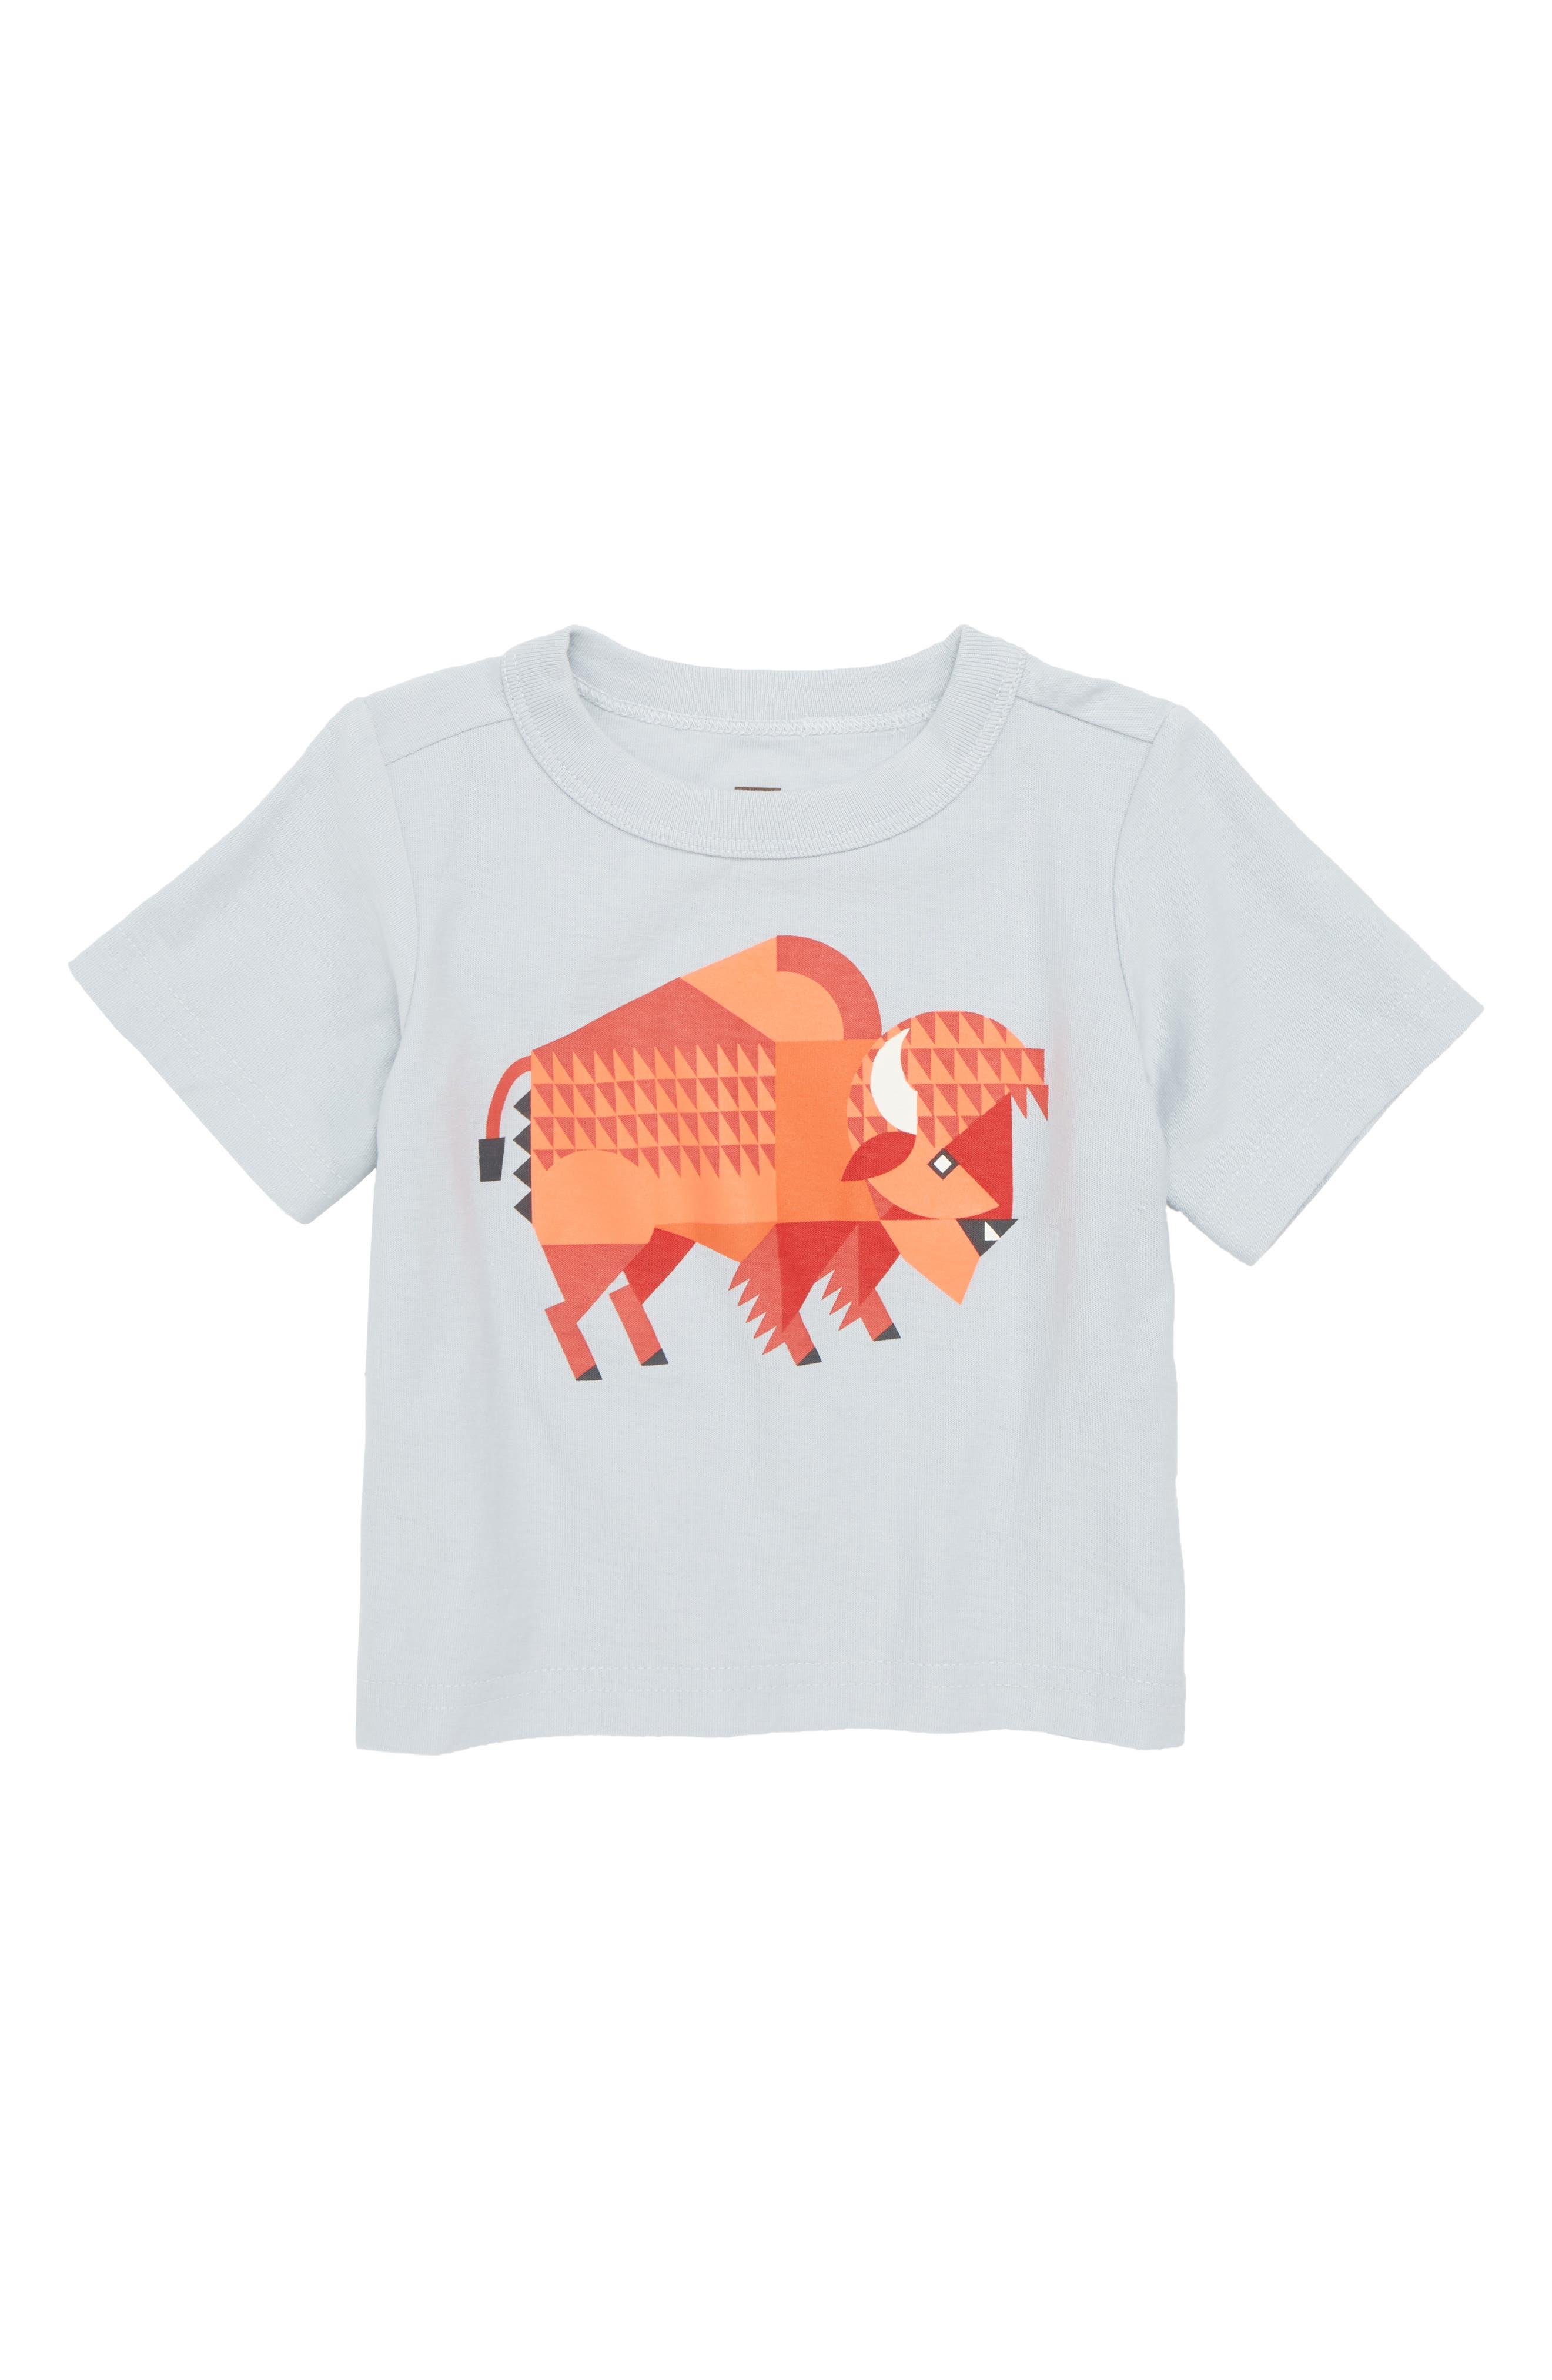 Bison T-Shirt,                             Main thumbnail 1, color,                             Horizon